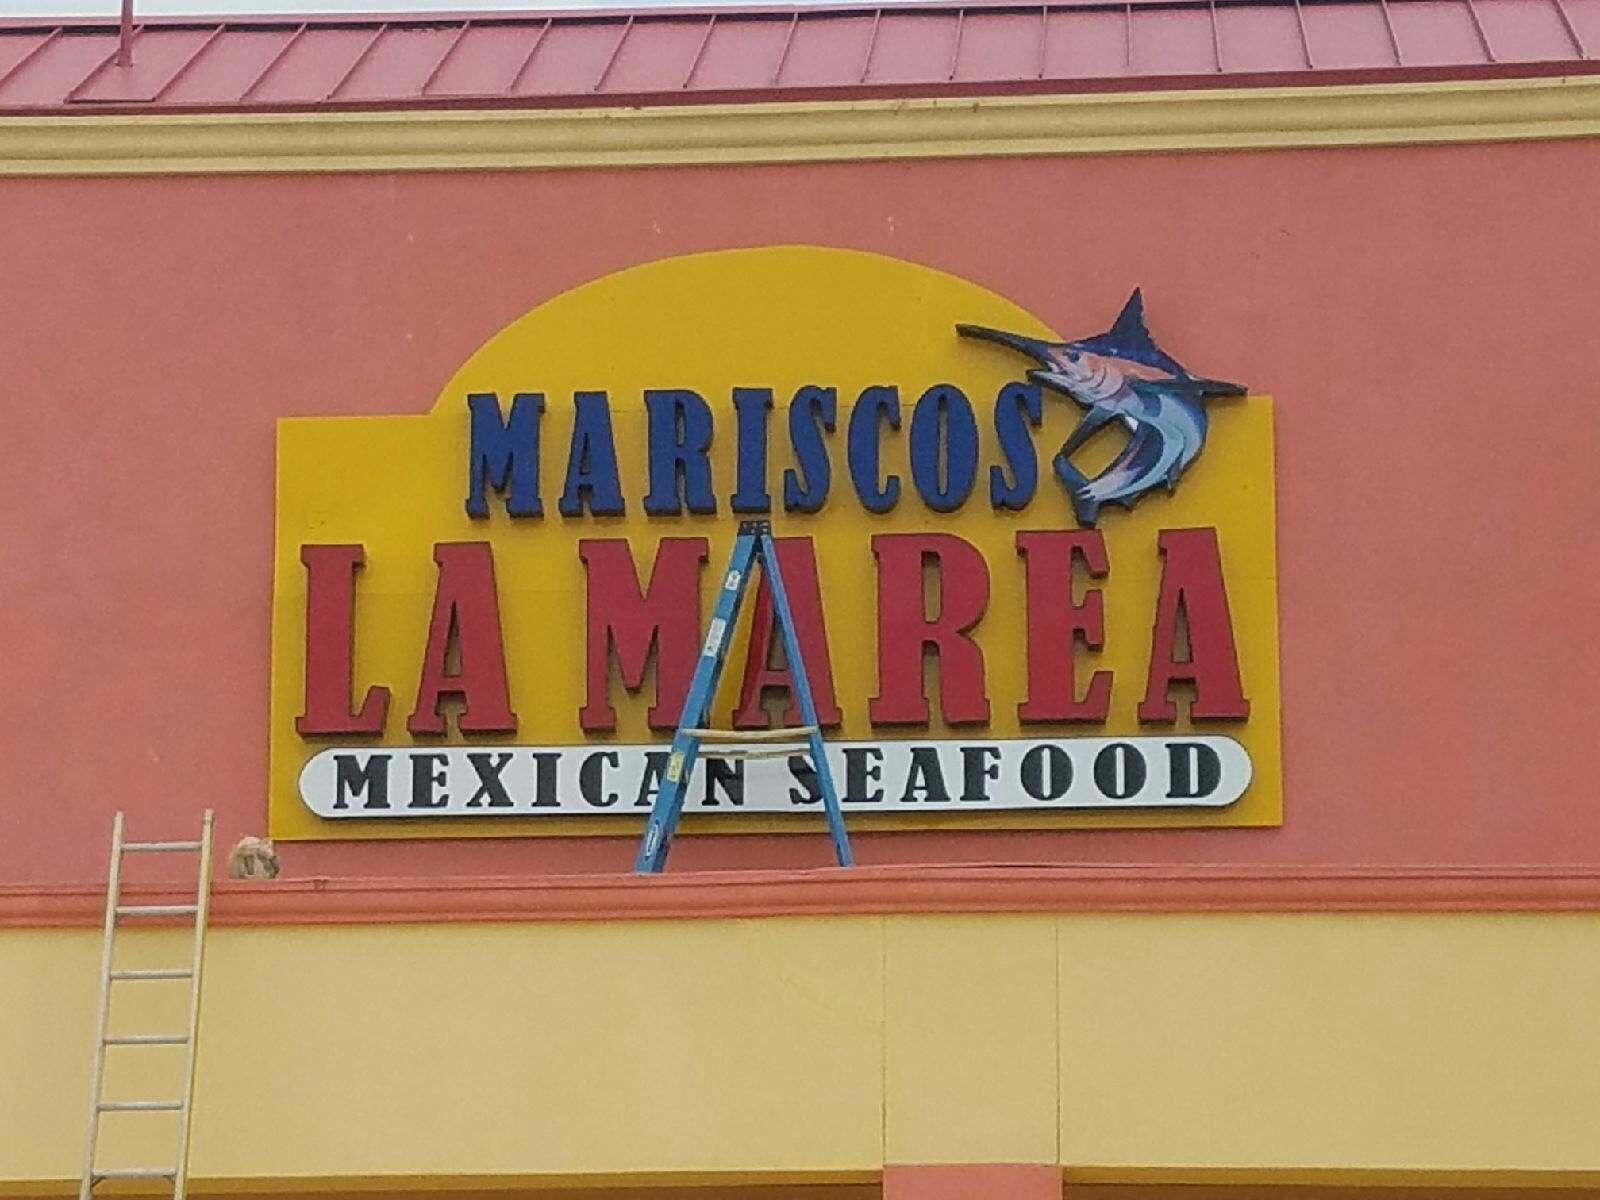 Mariscos La Marea Channel Letters